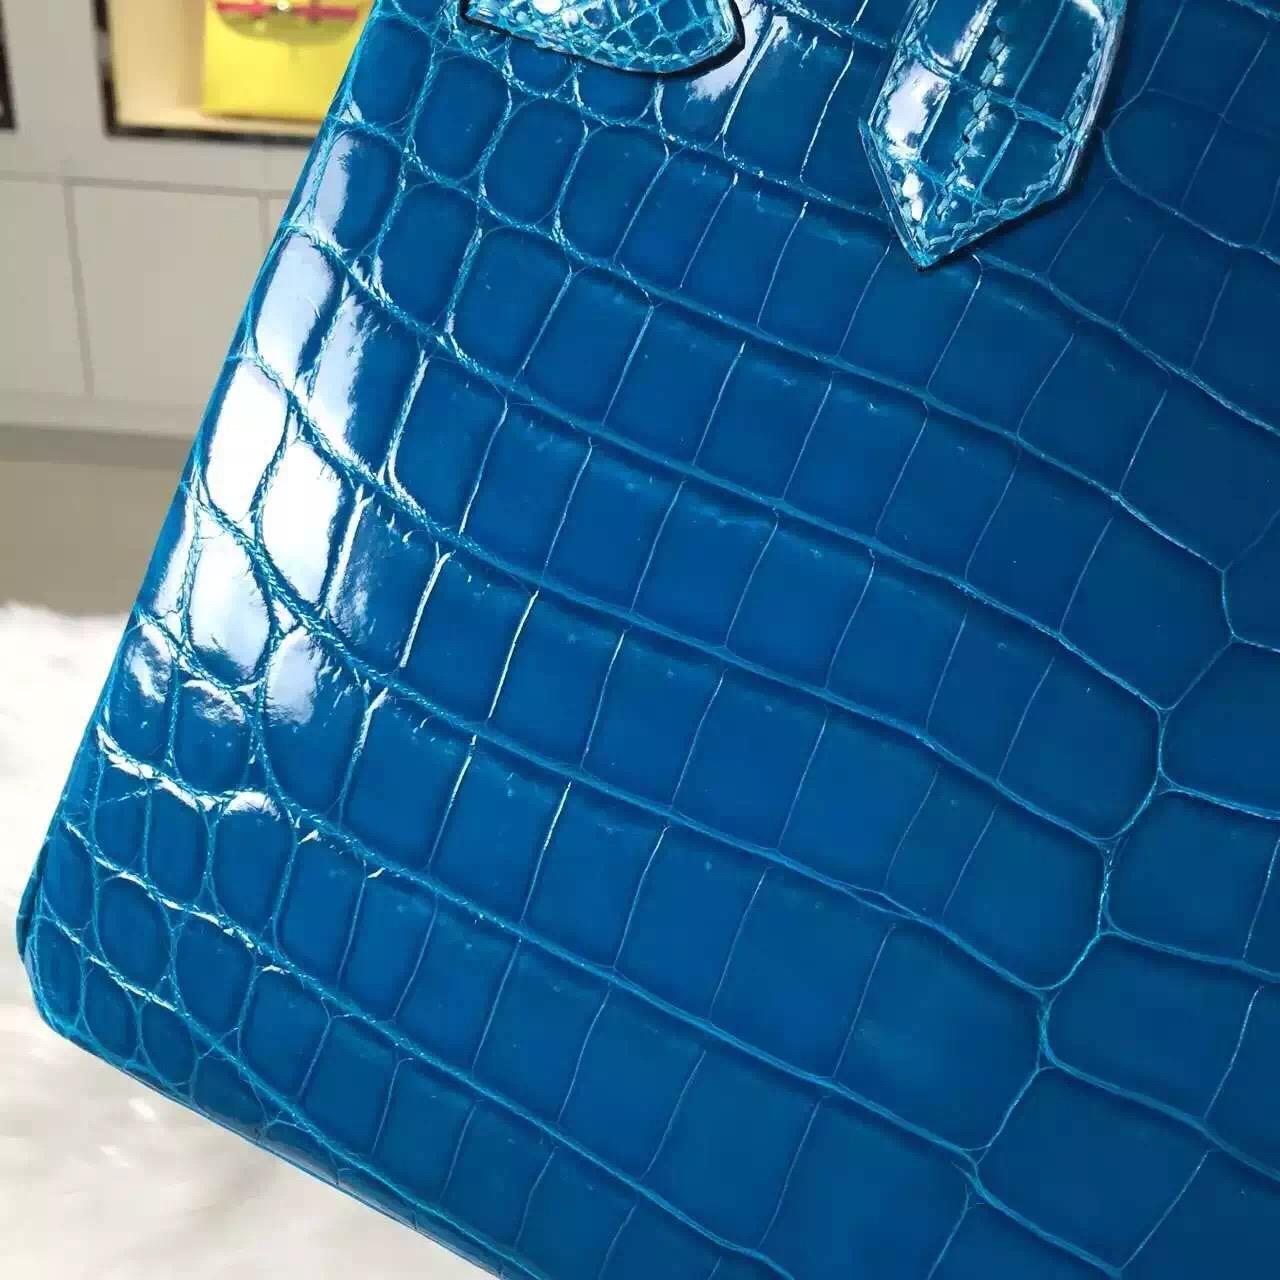 Discount Hermes 7W Blue Izmir Original Crocodile Leather Birkin Bag30cm Gold Hardware